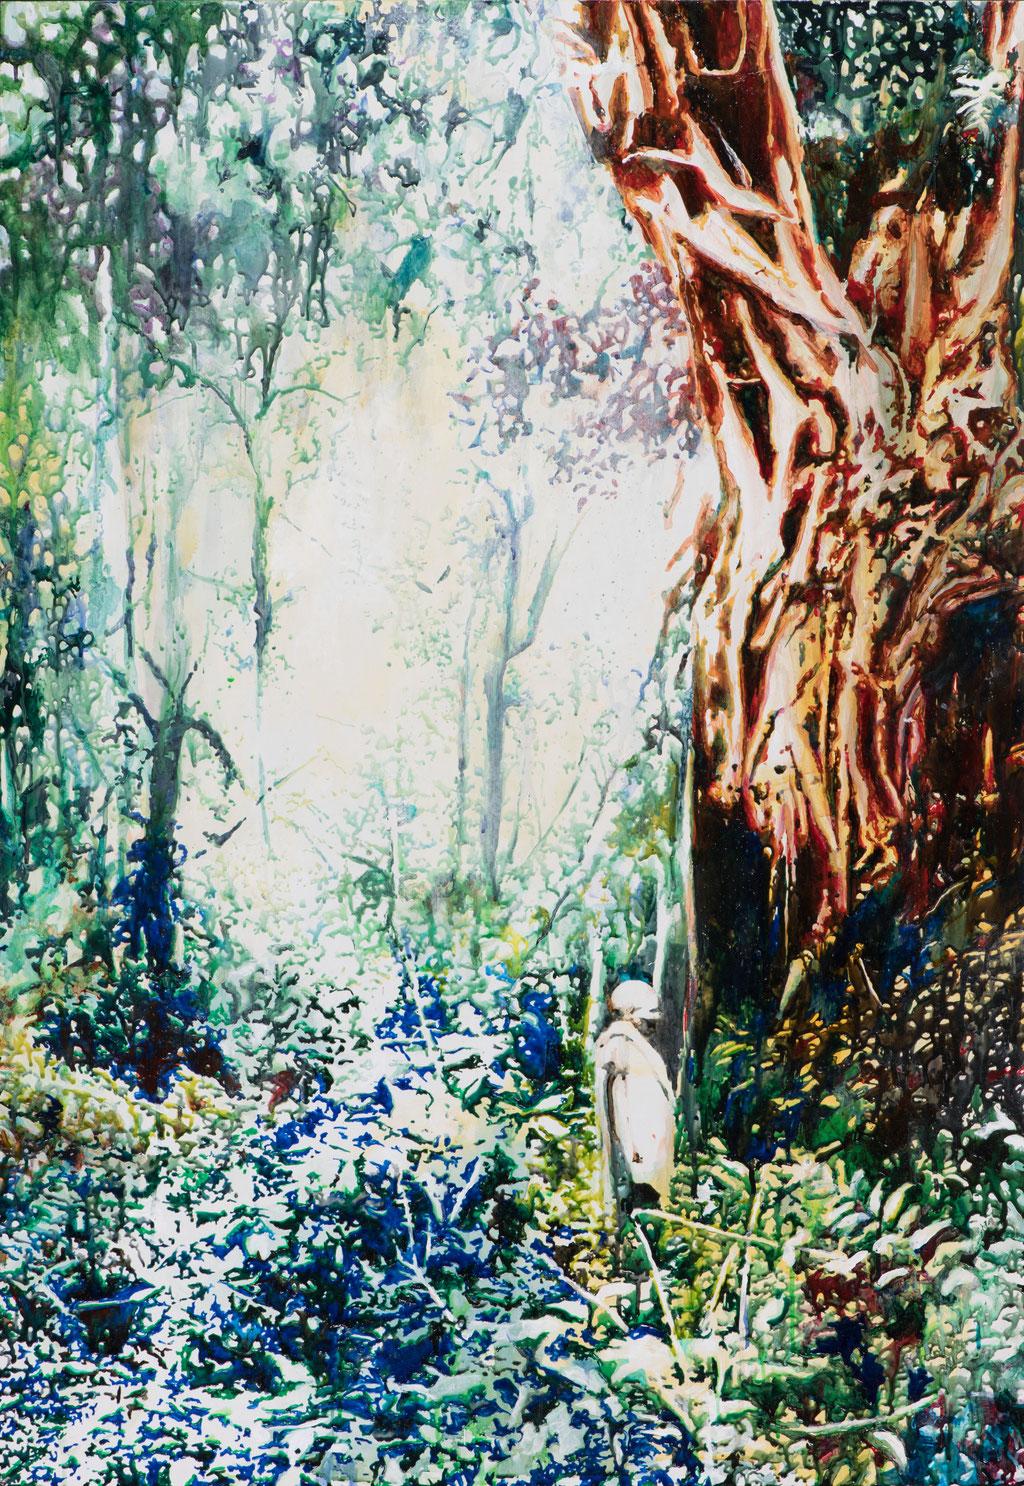 Colonial Dream, Glasmalfarben auf MDF Platte, 140 x 100 cm, 2018